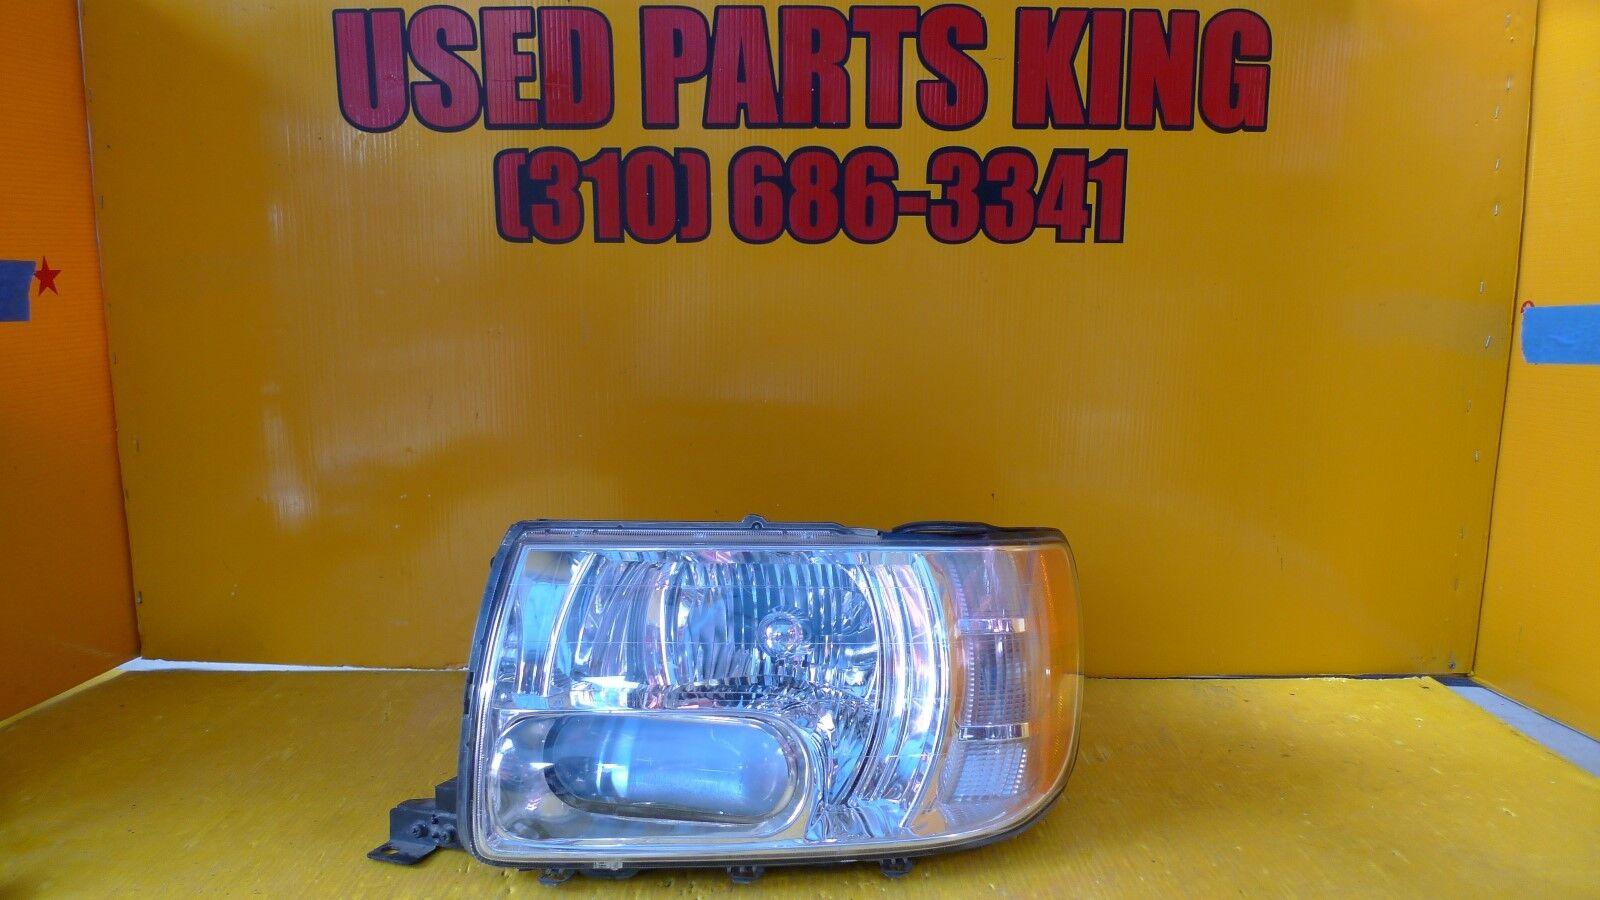 Used 2002 infiniti qx4 headlights for sale 2002 2003 infiniti qx4 xenon headlight oem lh driver side vanachro Gallery